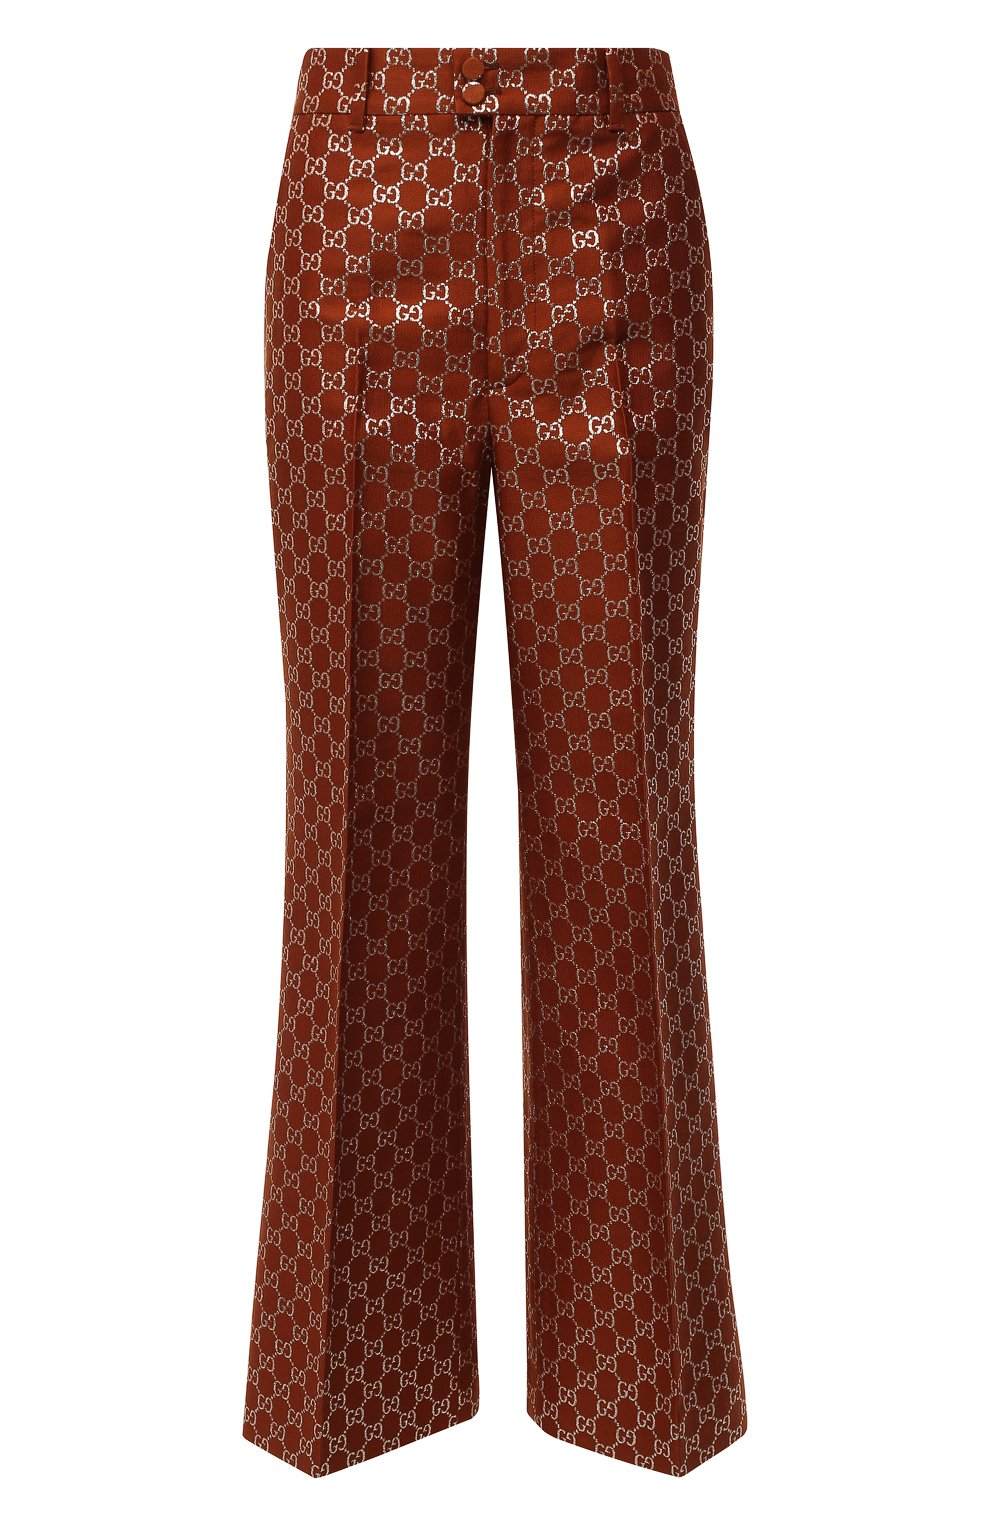 Женские брюки из шерсти и шелка GUCCI коричневого цвета, арт. 627877/ZAD7L | Фото 1